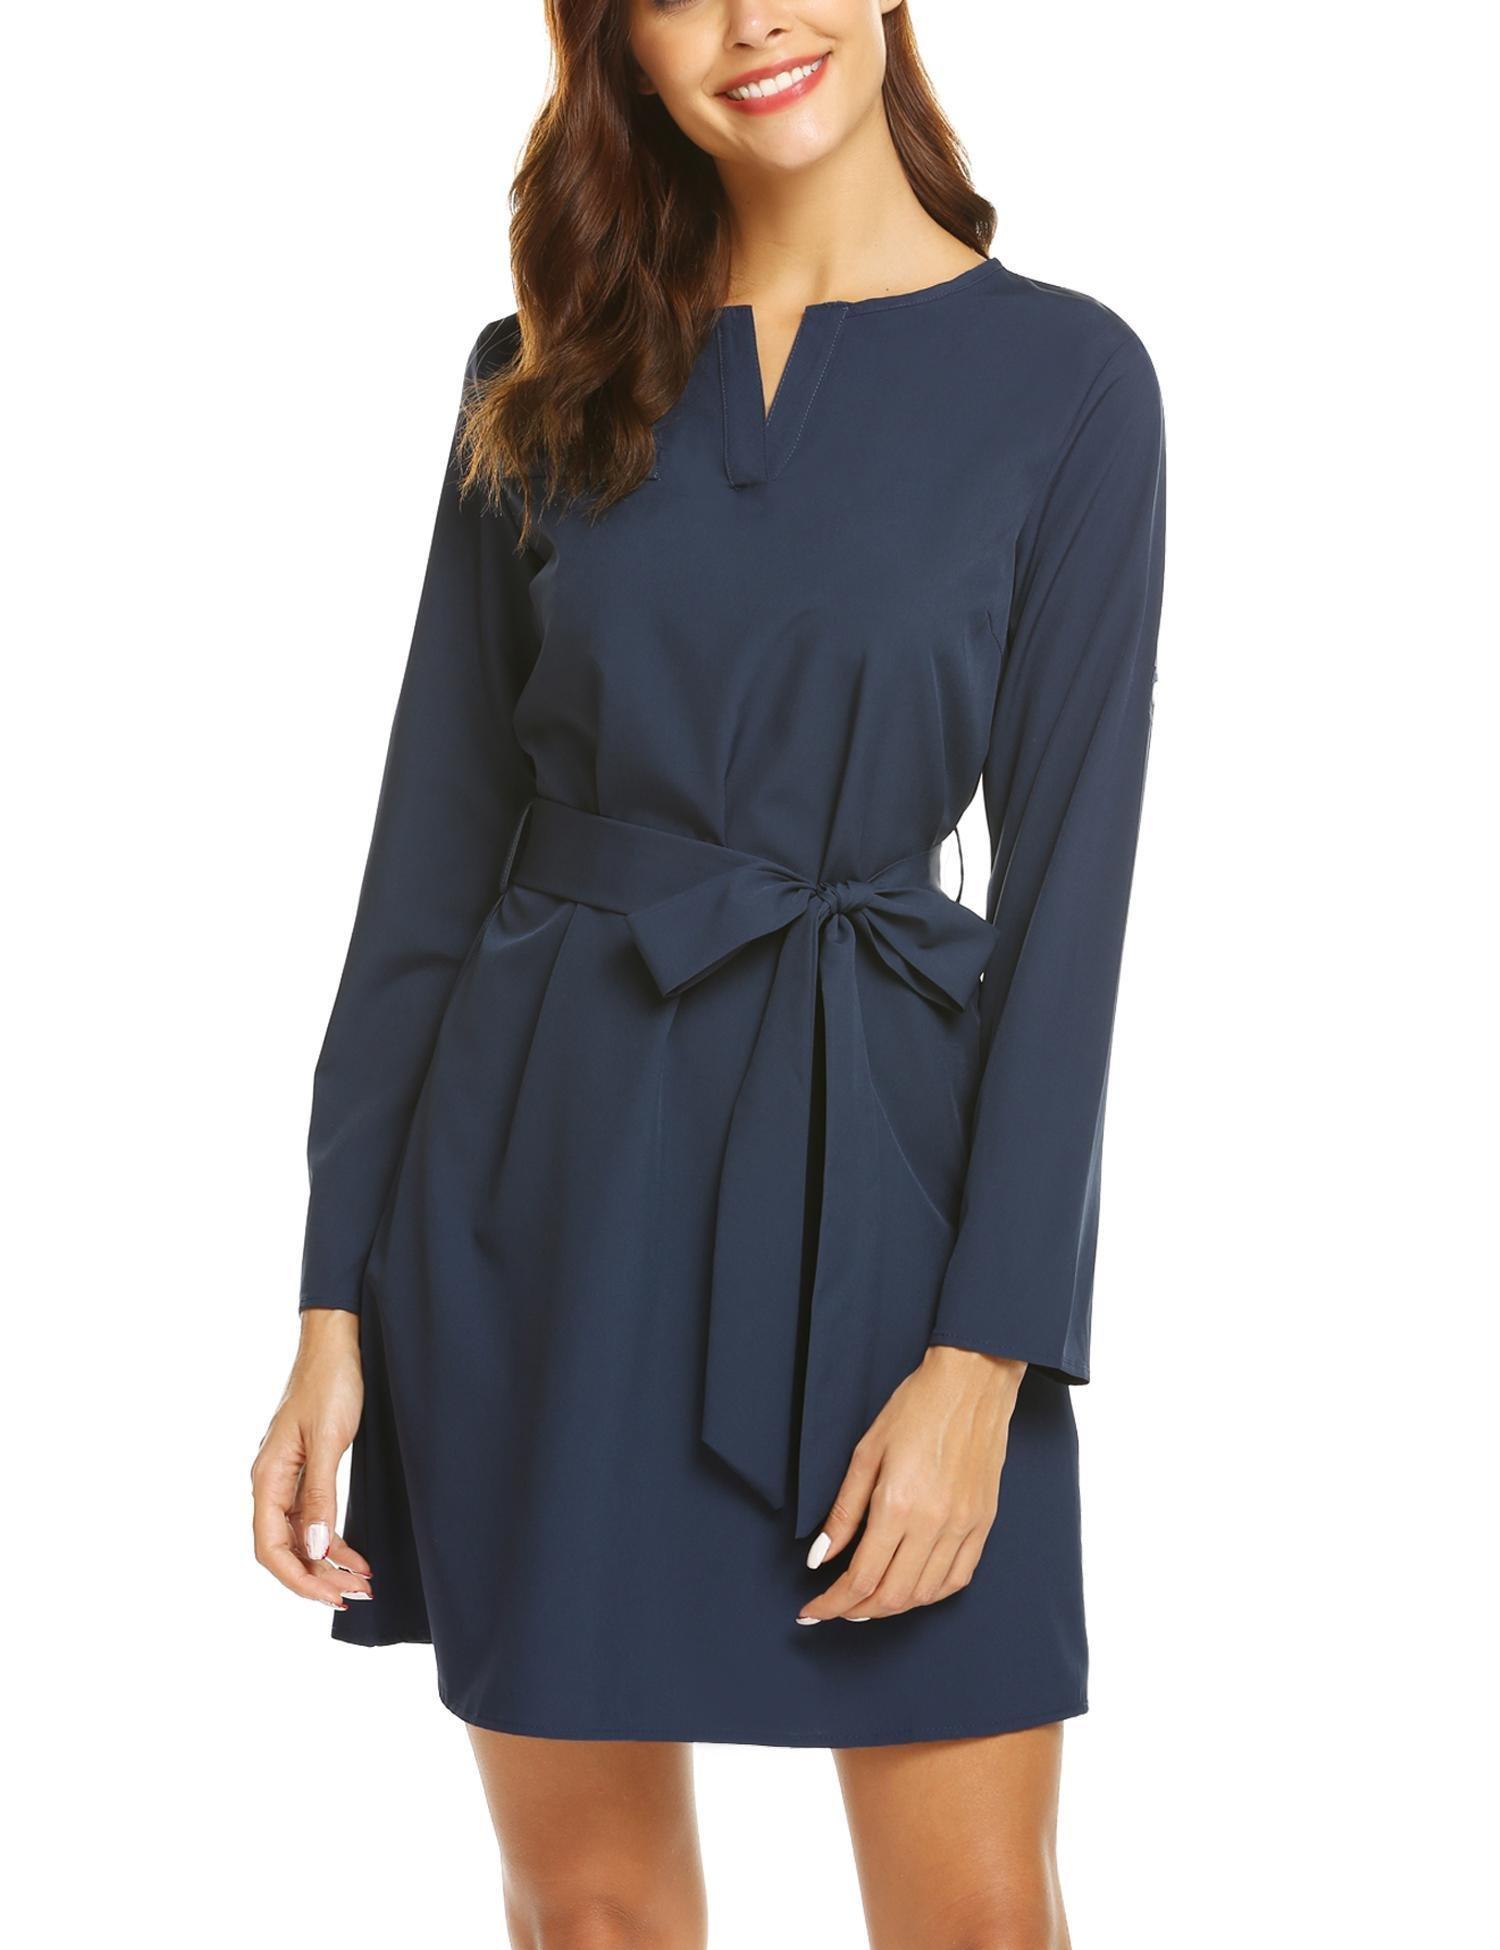 SE MIU Women Shirt Mini Solid O Neck Business Belted Tunic Dress, Navy Blue, L